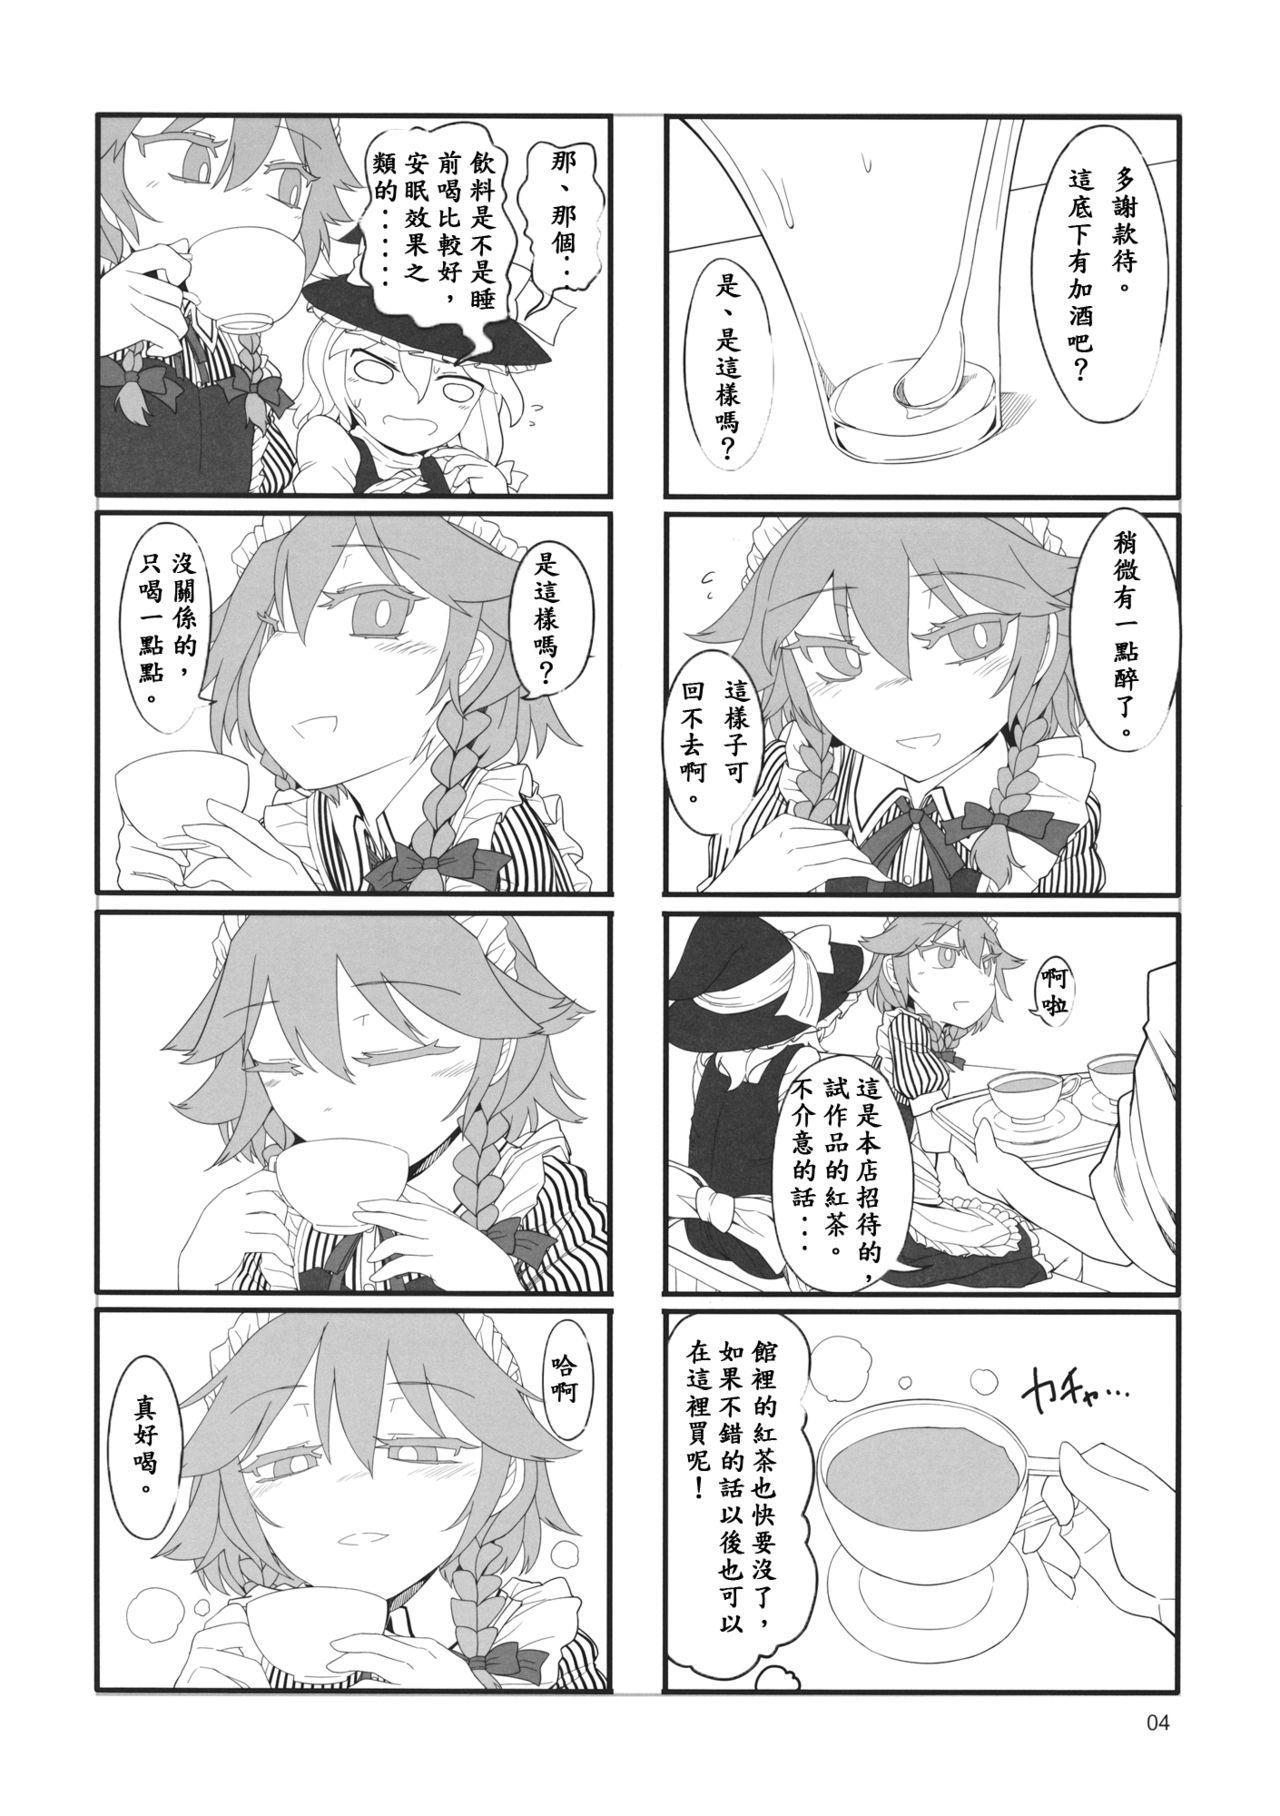 Sakuya Doll 3